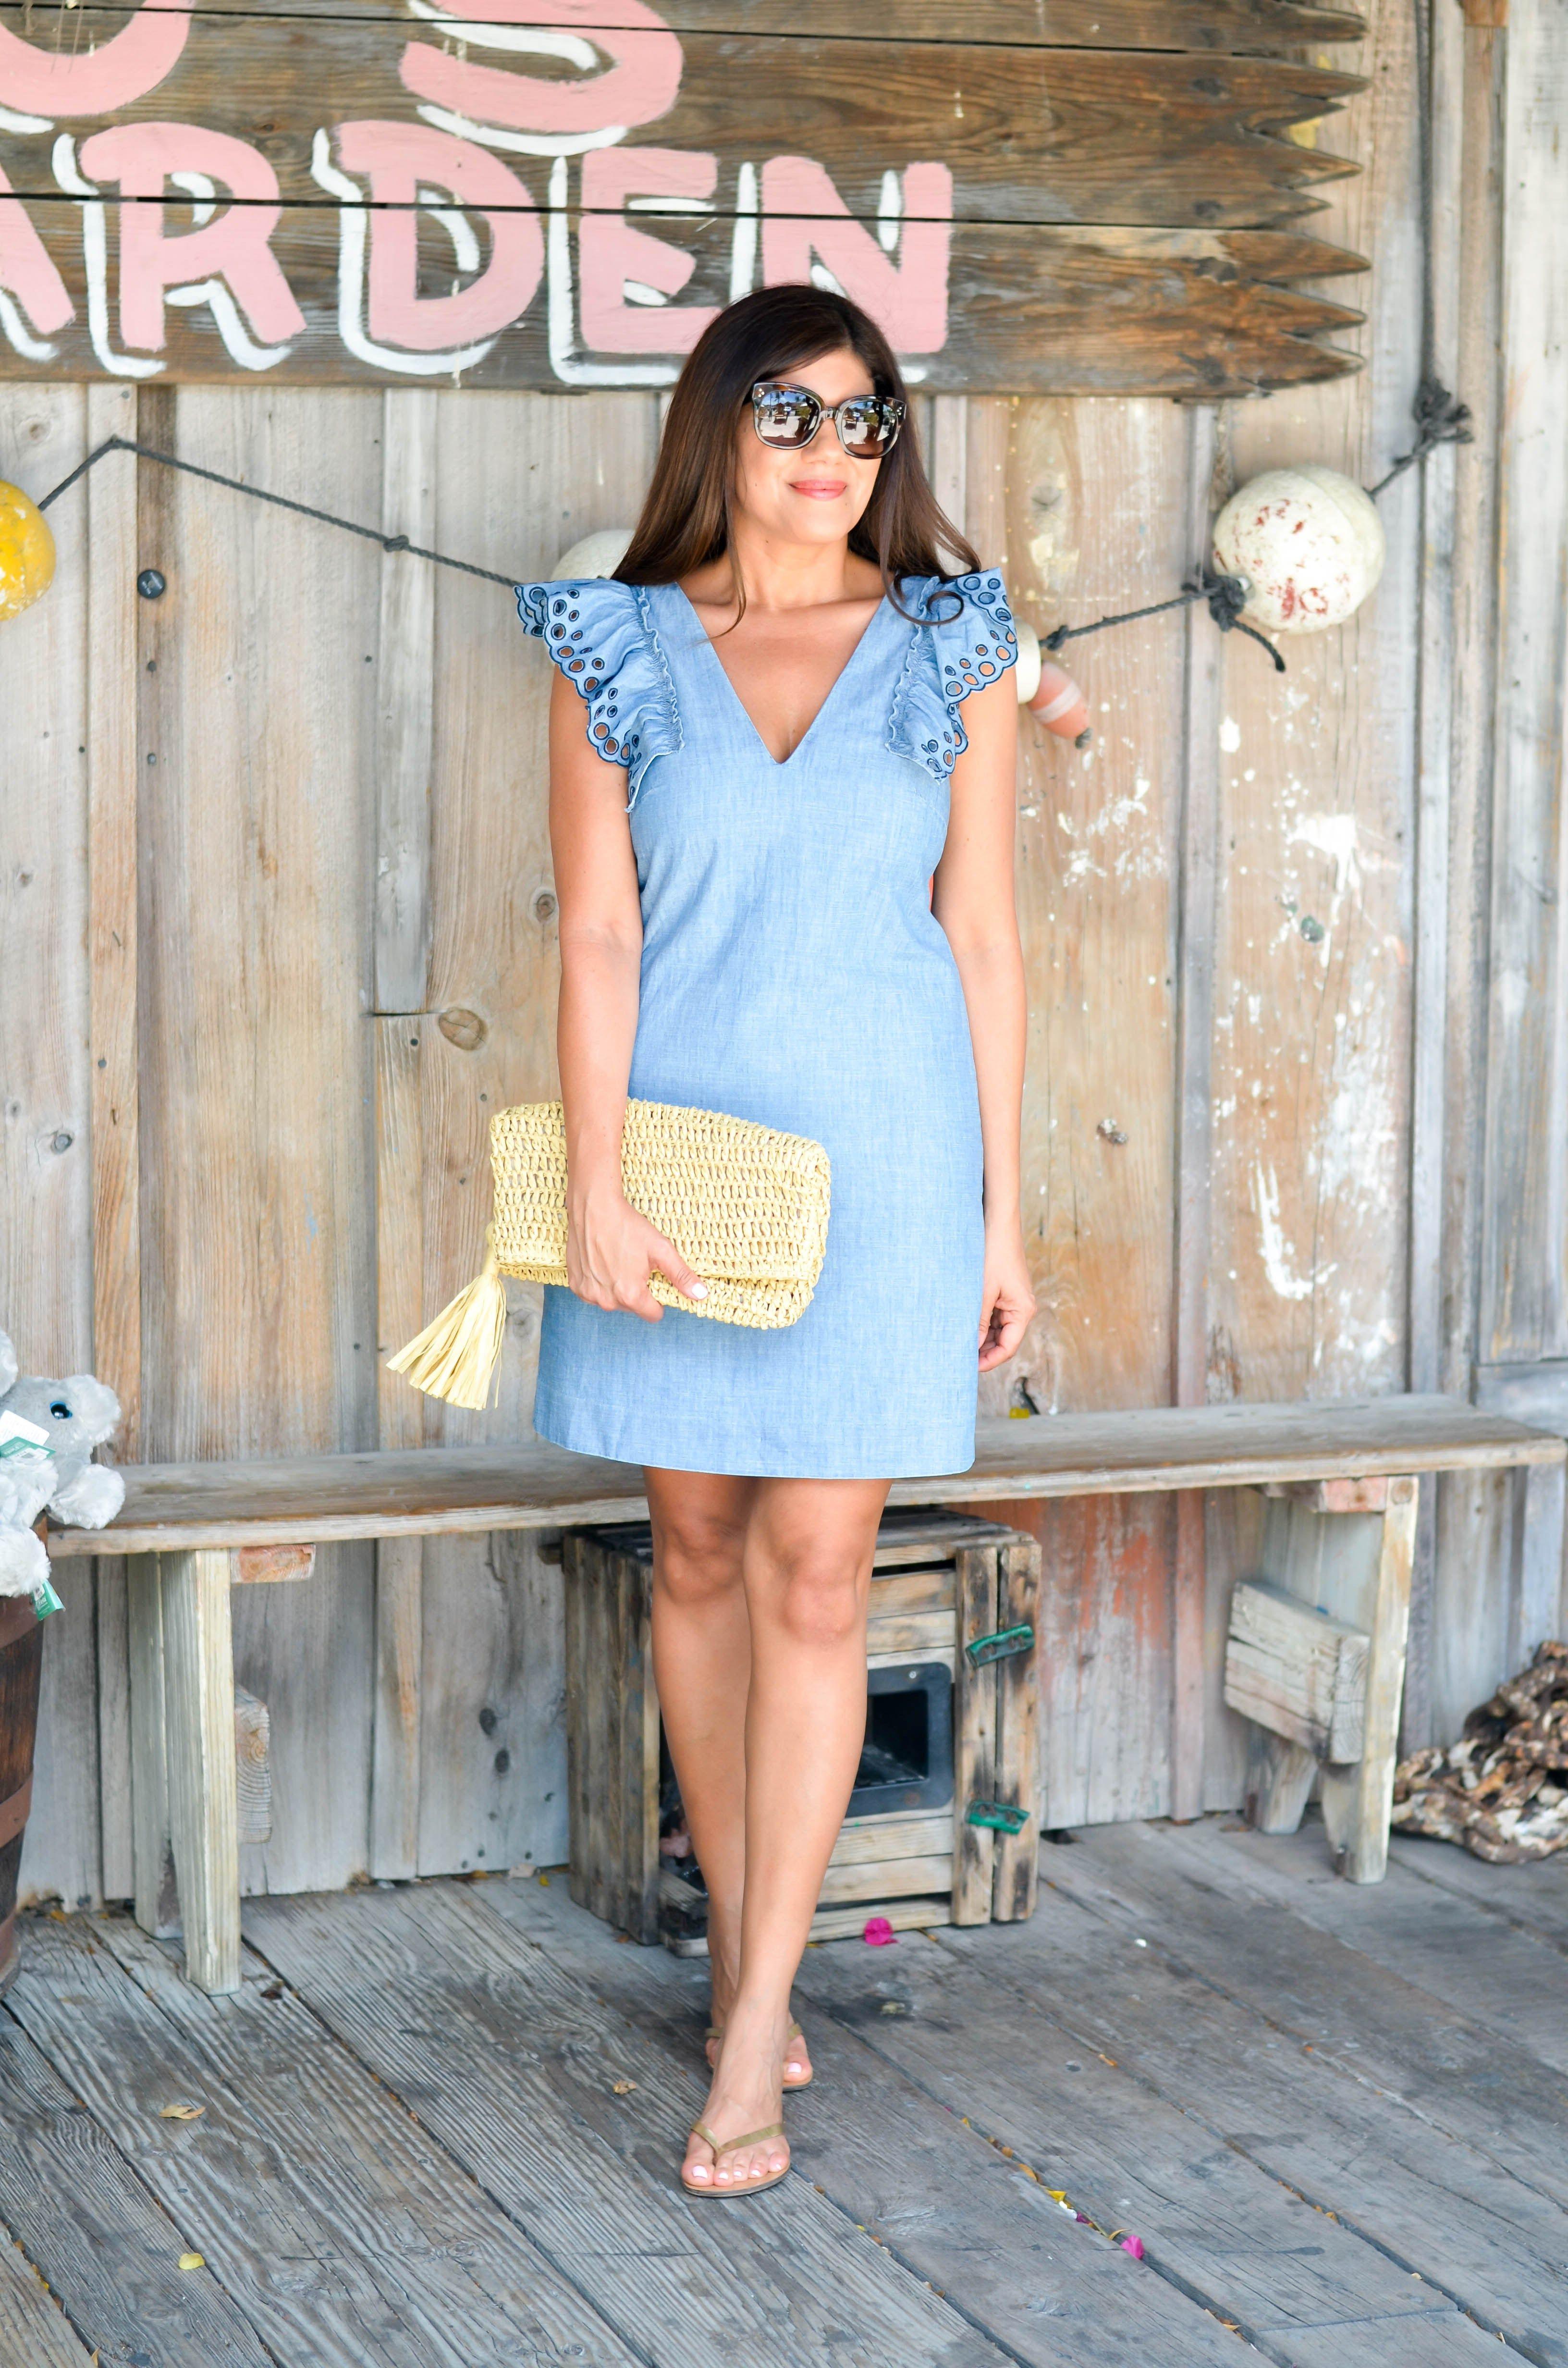 Summer Dress Series The Perfect Go To Sheath Dress Beautifully Seaside Dresses Sheath Dress Spring Summer Fashion [ 4928 x 3264 Pixel ]